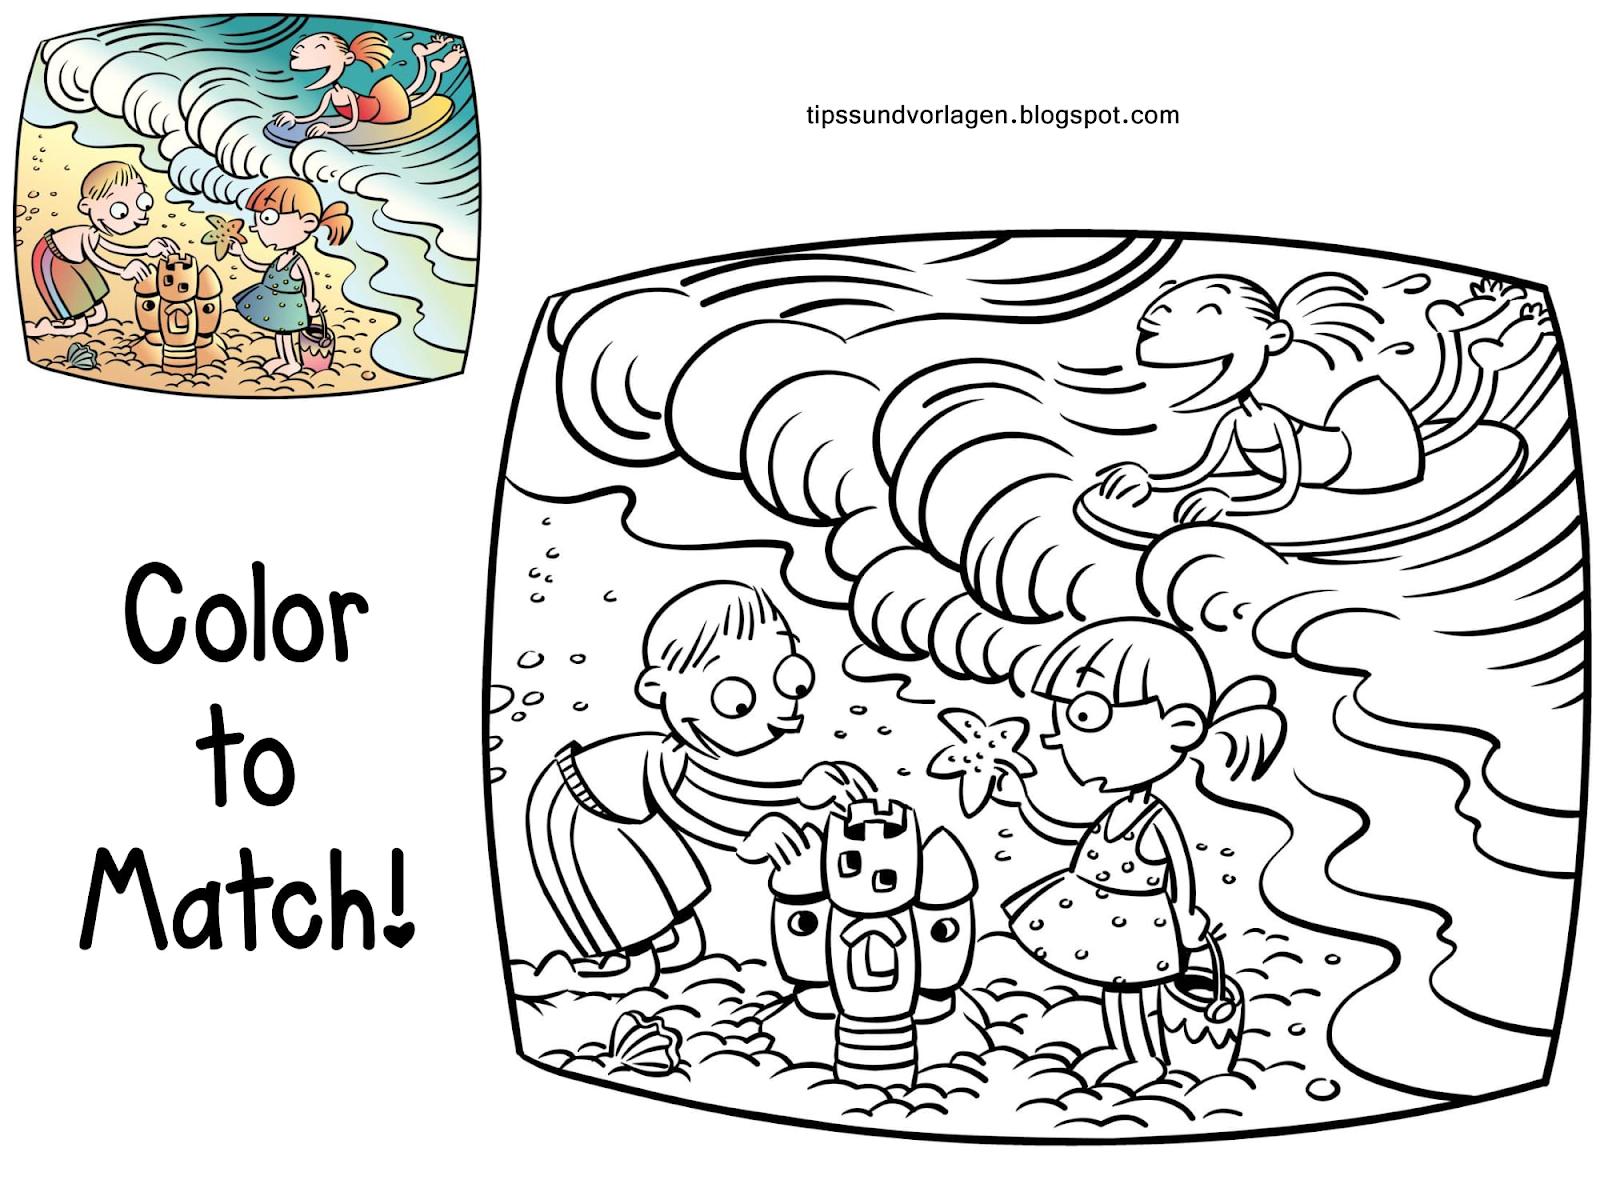 - Summer Coloring Pages For Toddler - Tipss Und Vorlagen